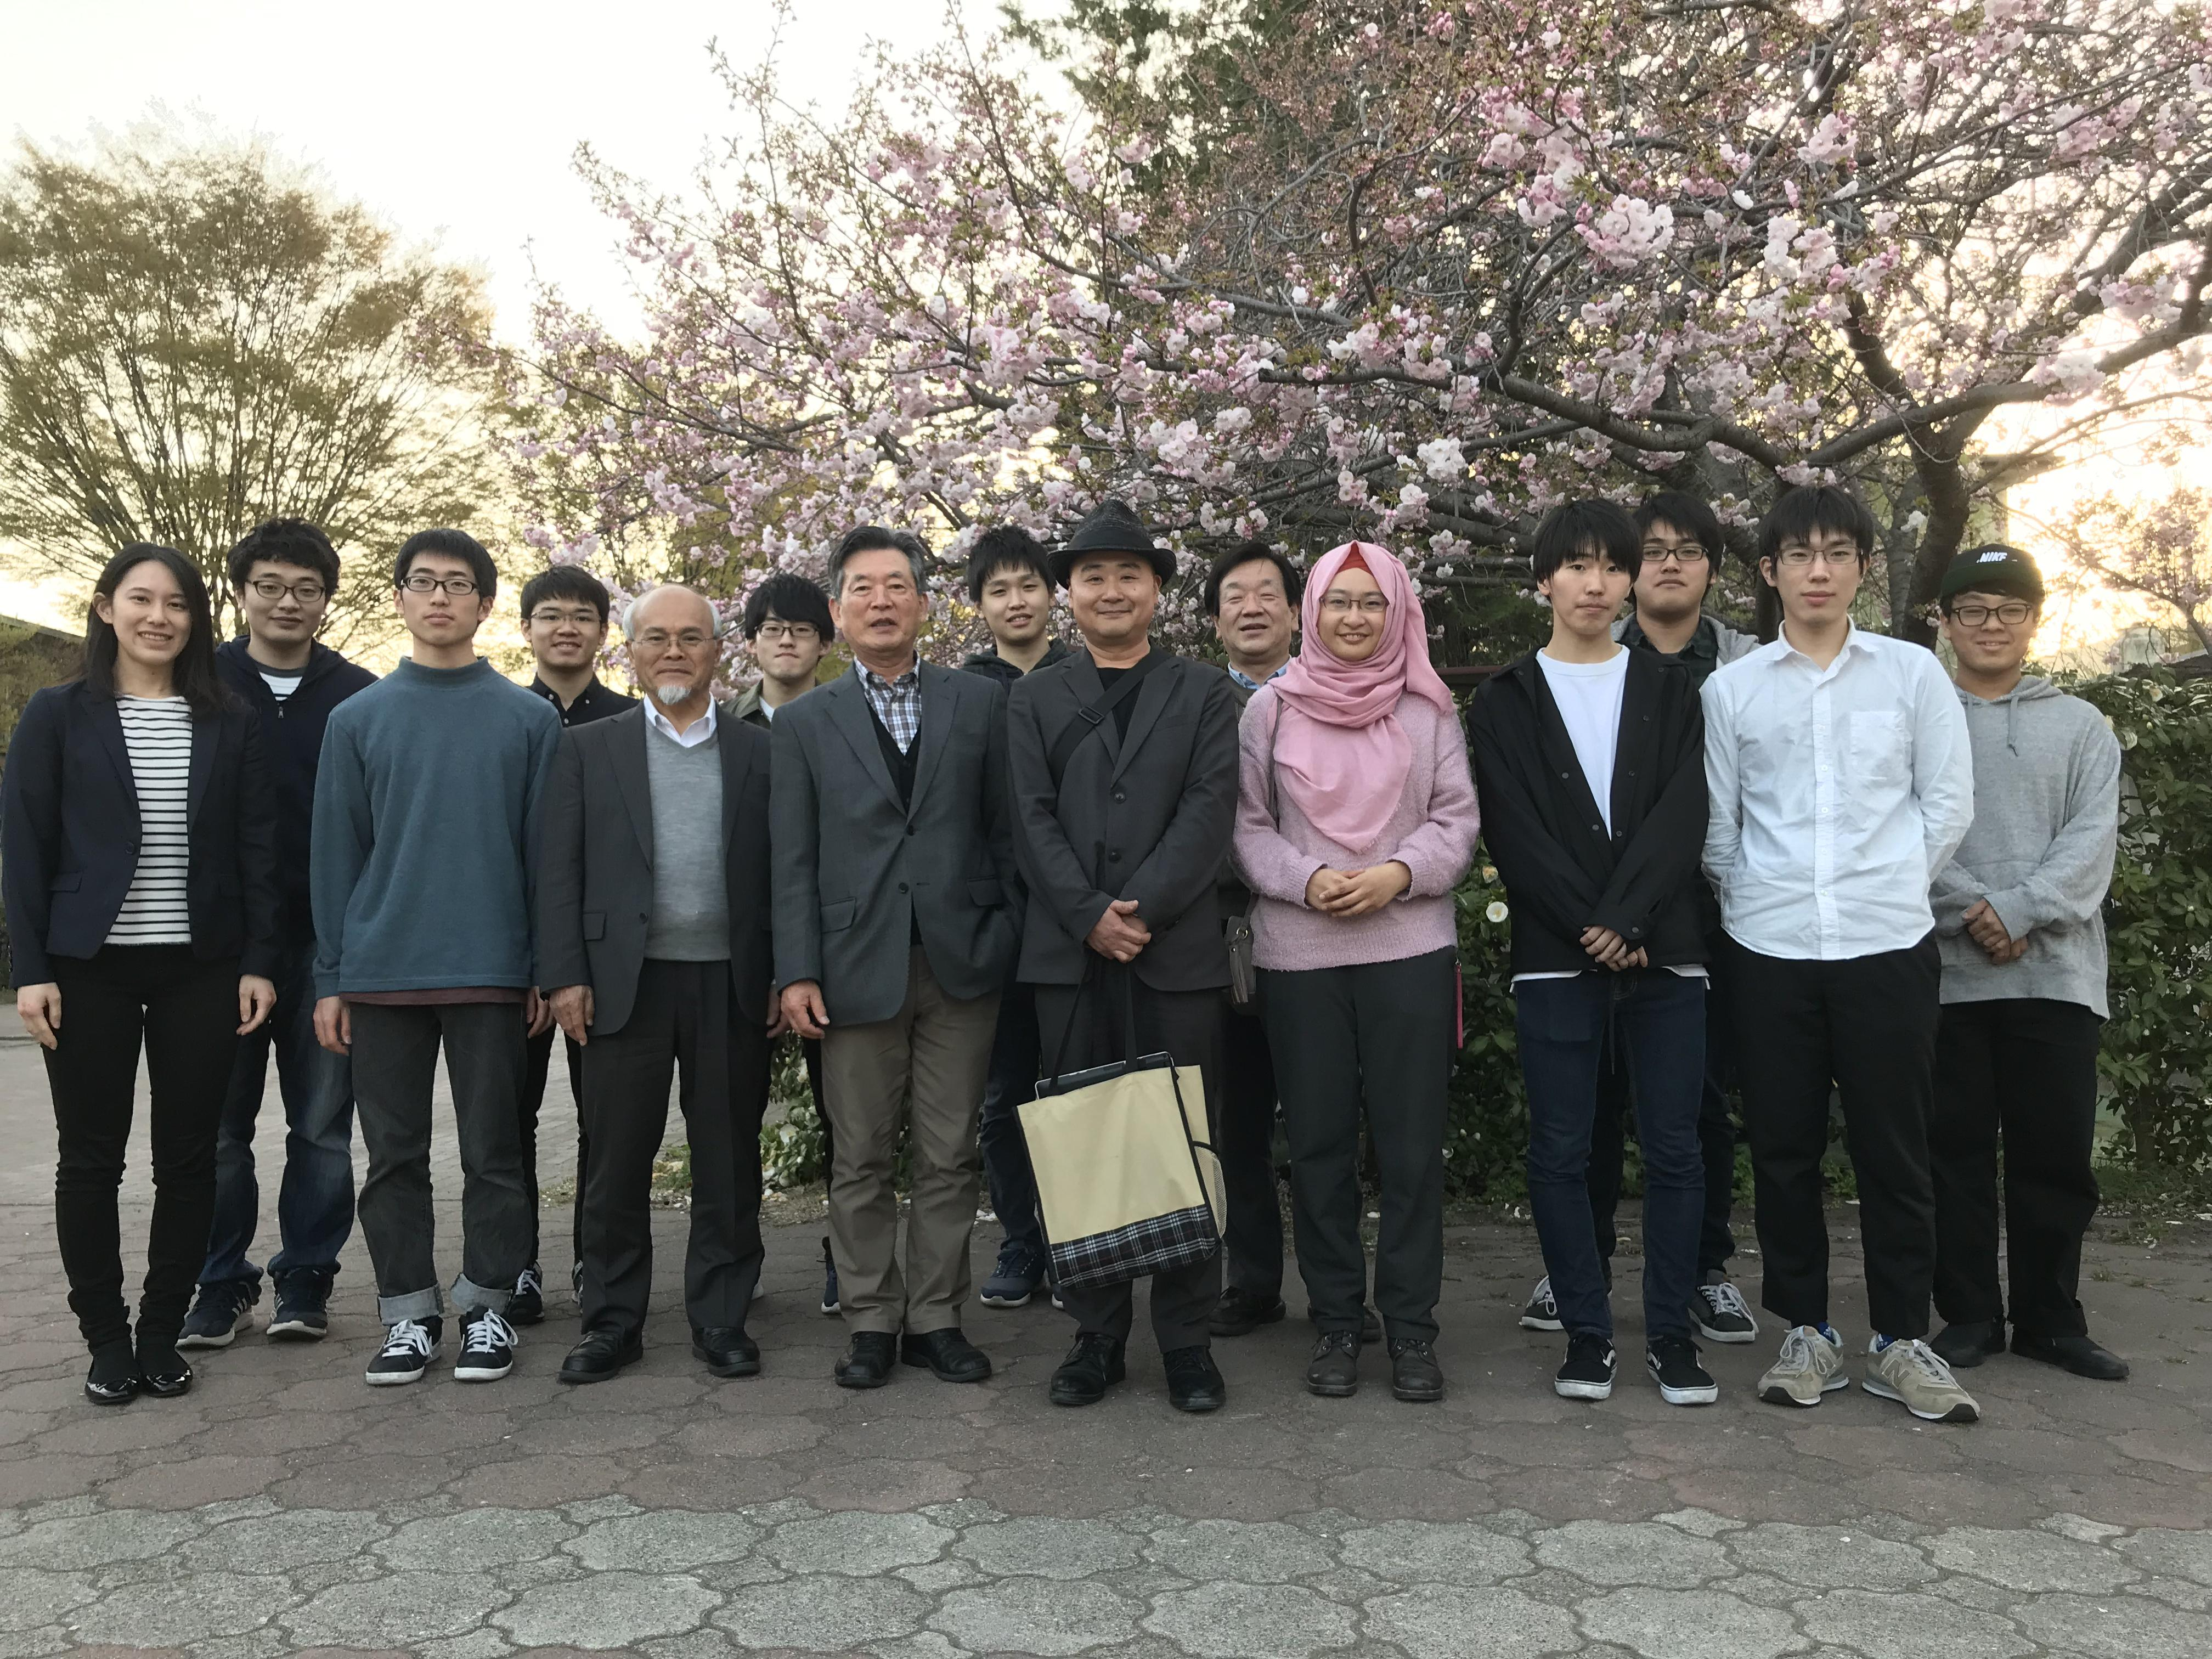 http://www.shinshu-u.ac.jp/faculty/engineering/chair/elec005/news/2019-04-22%2018.04.37.jpg